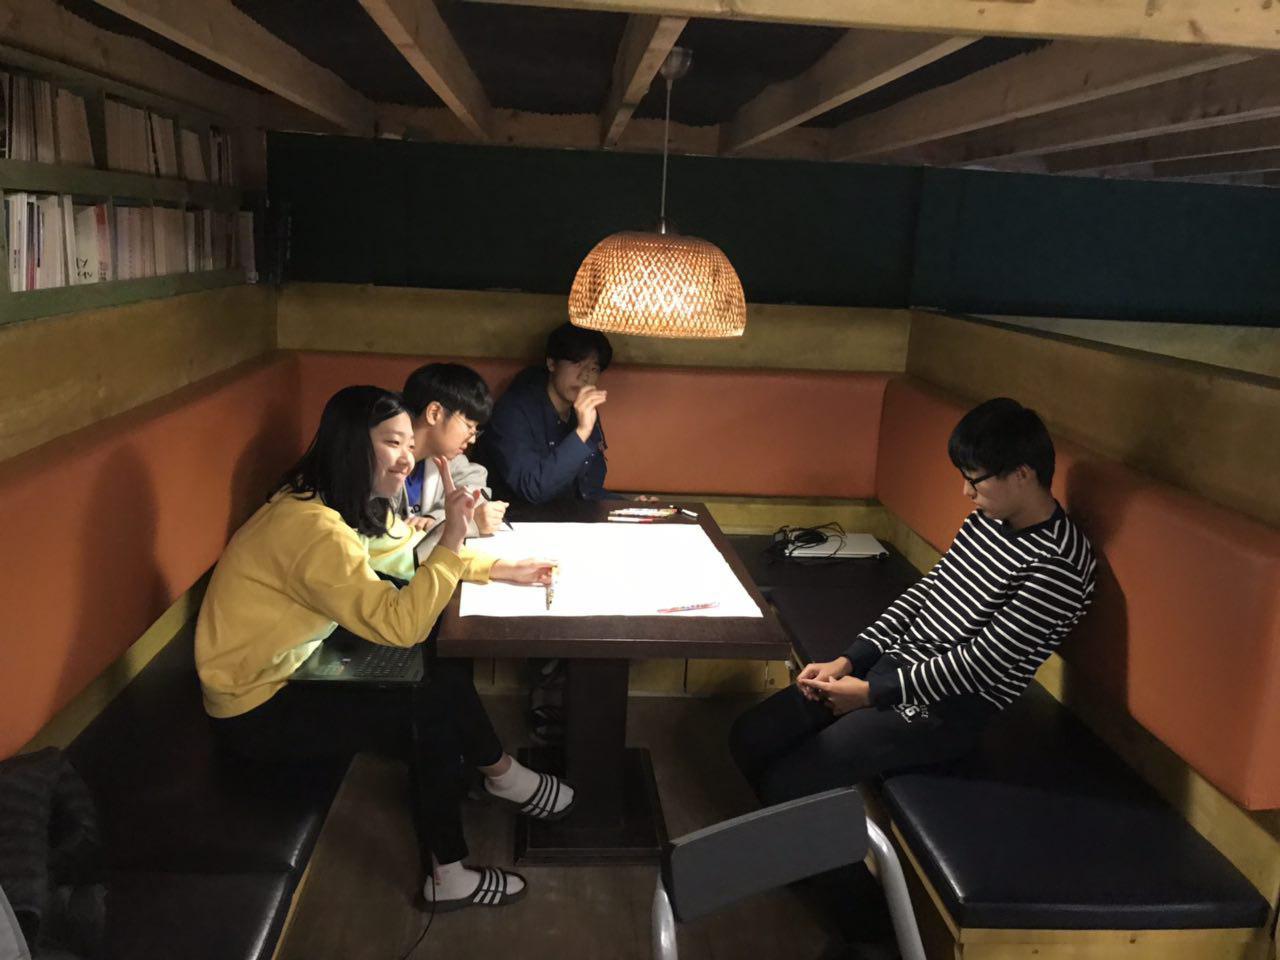 photo_2018-10-13_21-03-38.jpg